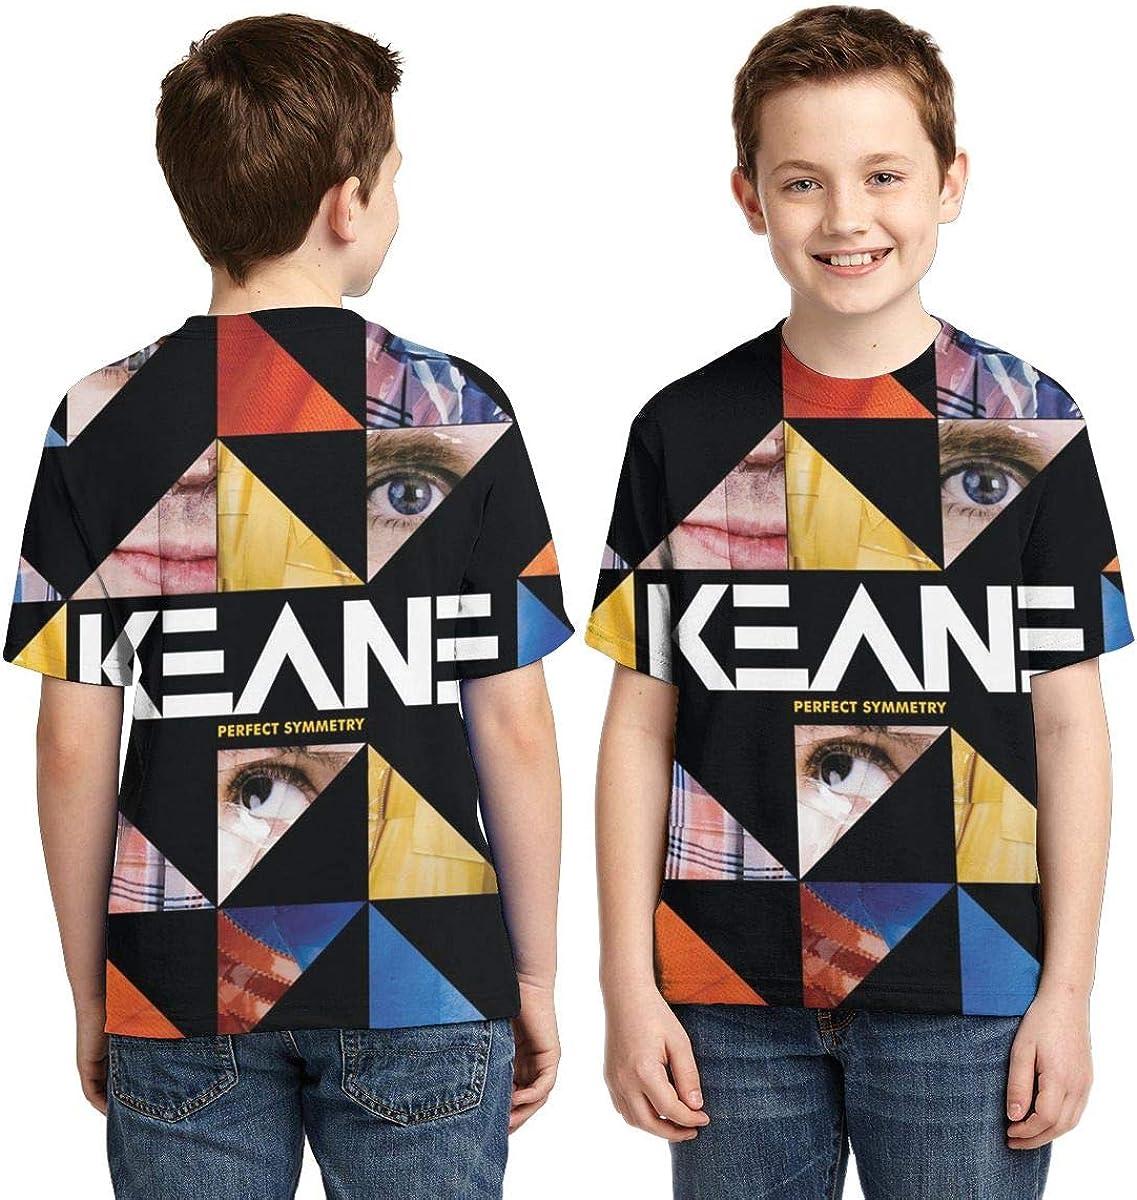 BowersJ Kids Keane Perfect Symmetry Design 3D Printed Short Sleeve Tees for Girls /& Boys Black